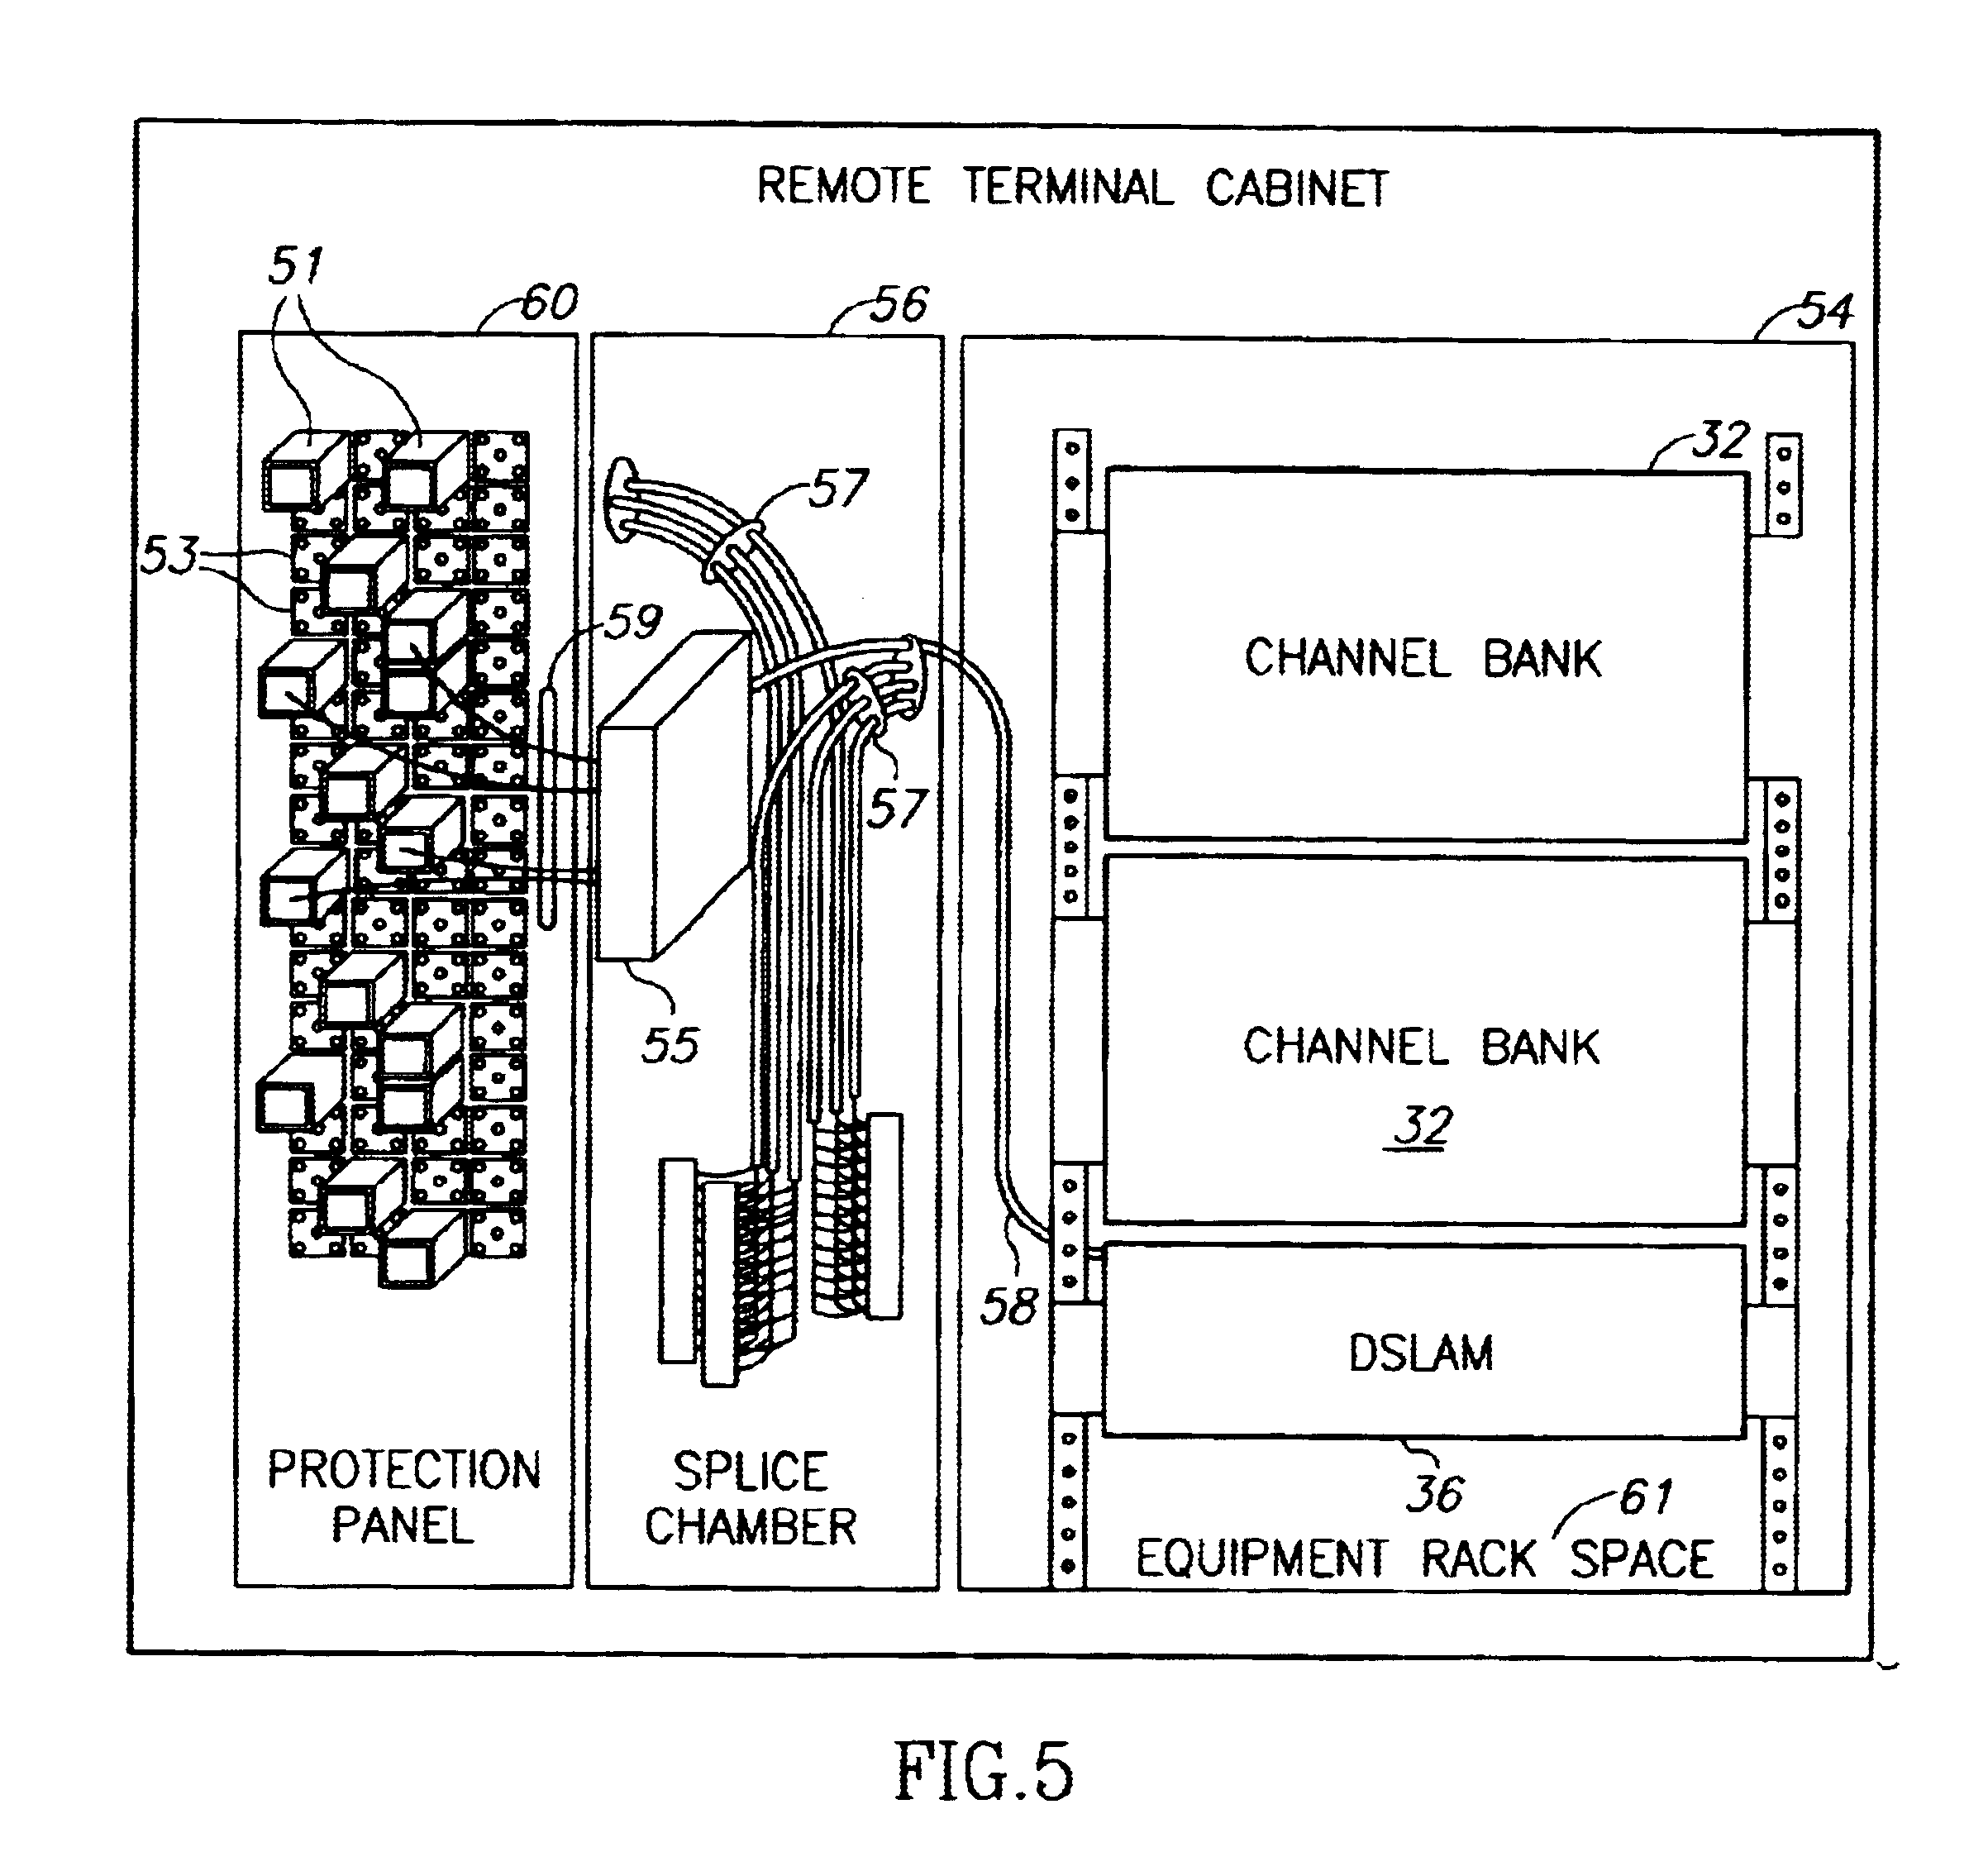 Amazing Centurylink Dsl Wiring Diagram Pictures - Wiring Diagram ...